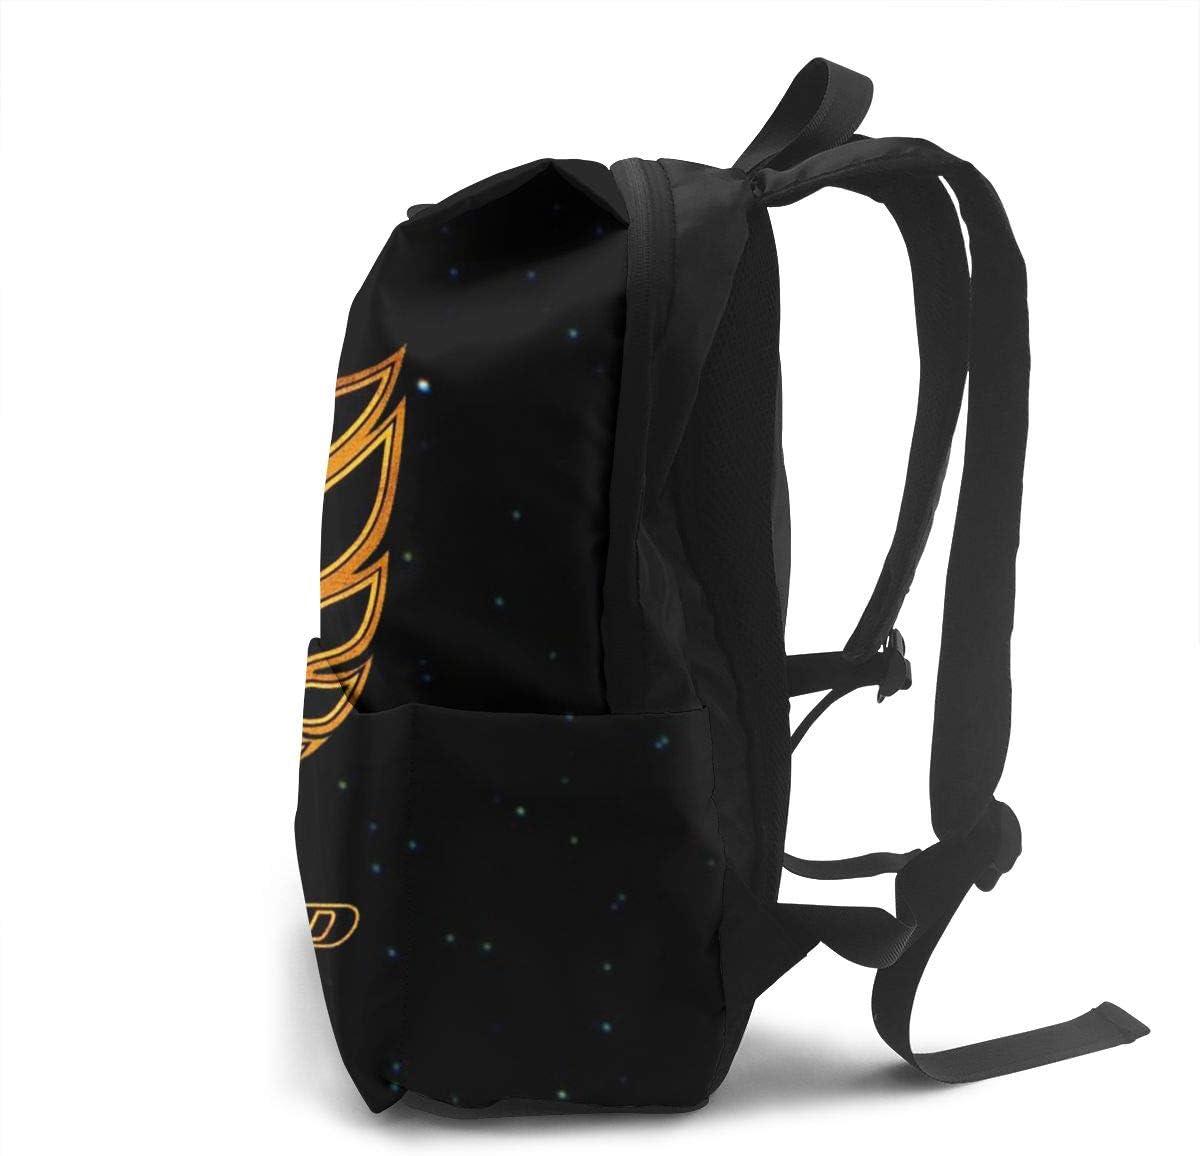 Veta Megica Pontiac Trans Am Firebird Student Bag Bookbag Backpack Laptop Bag